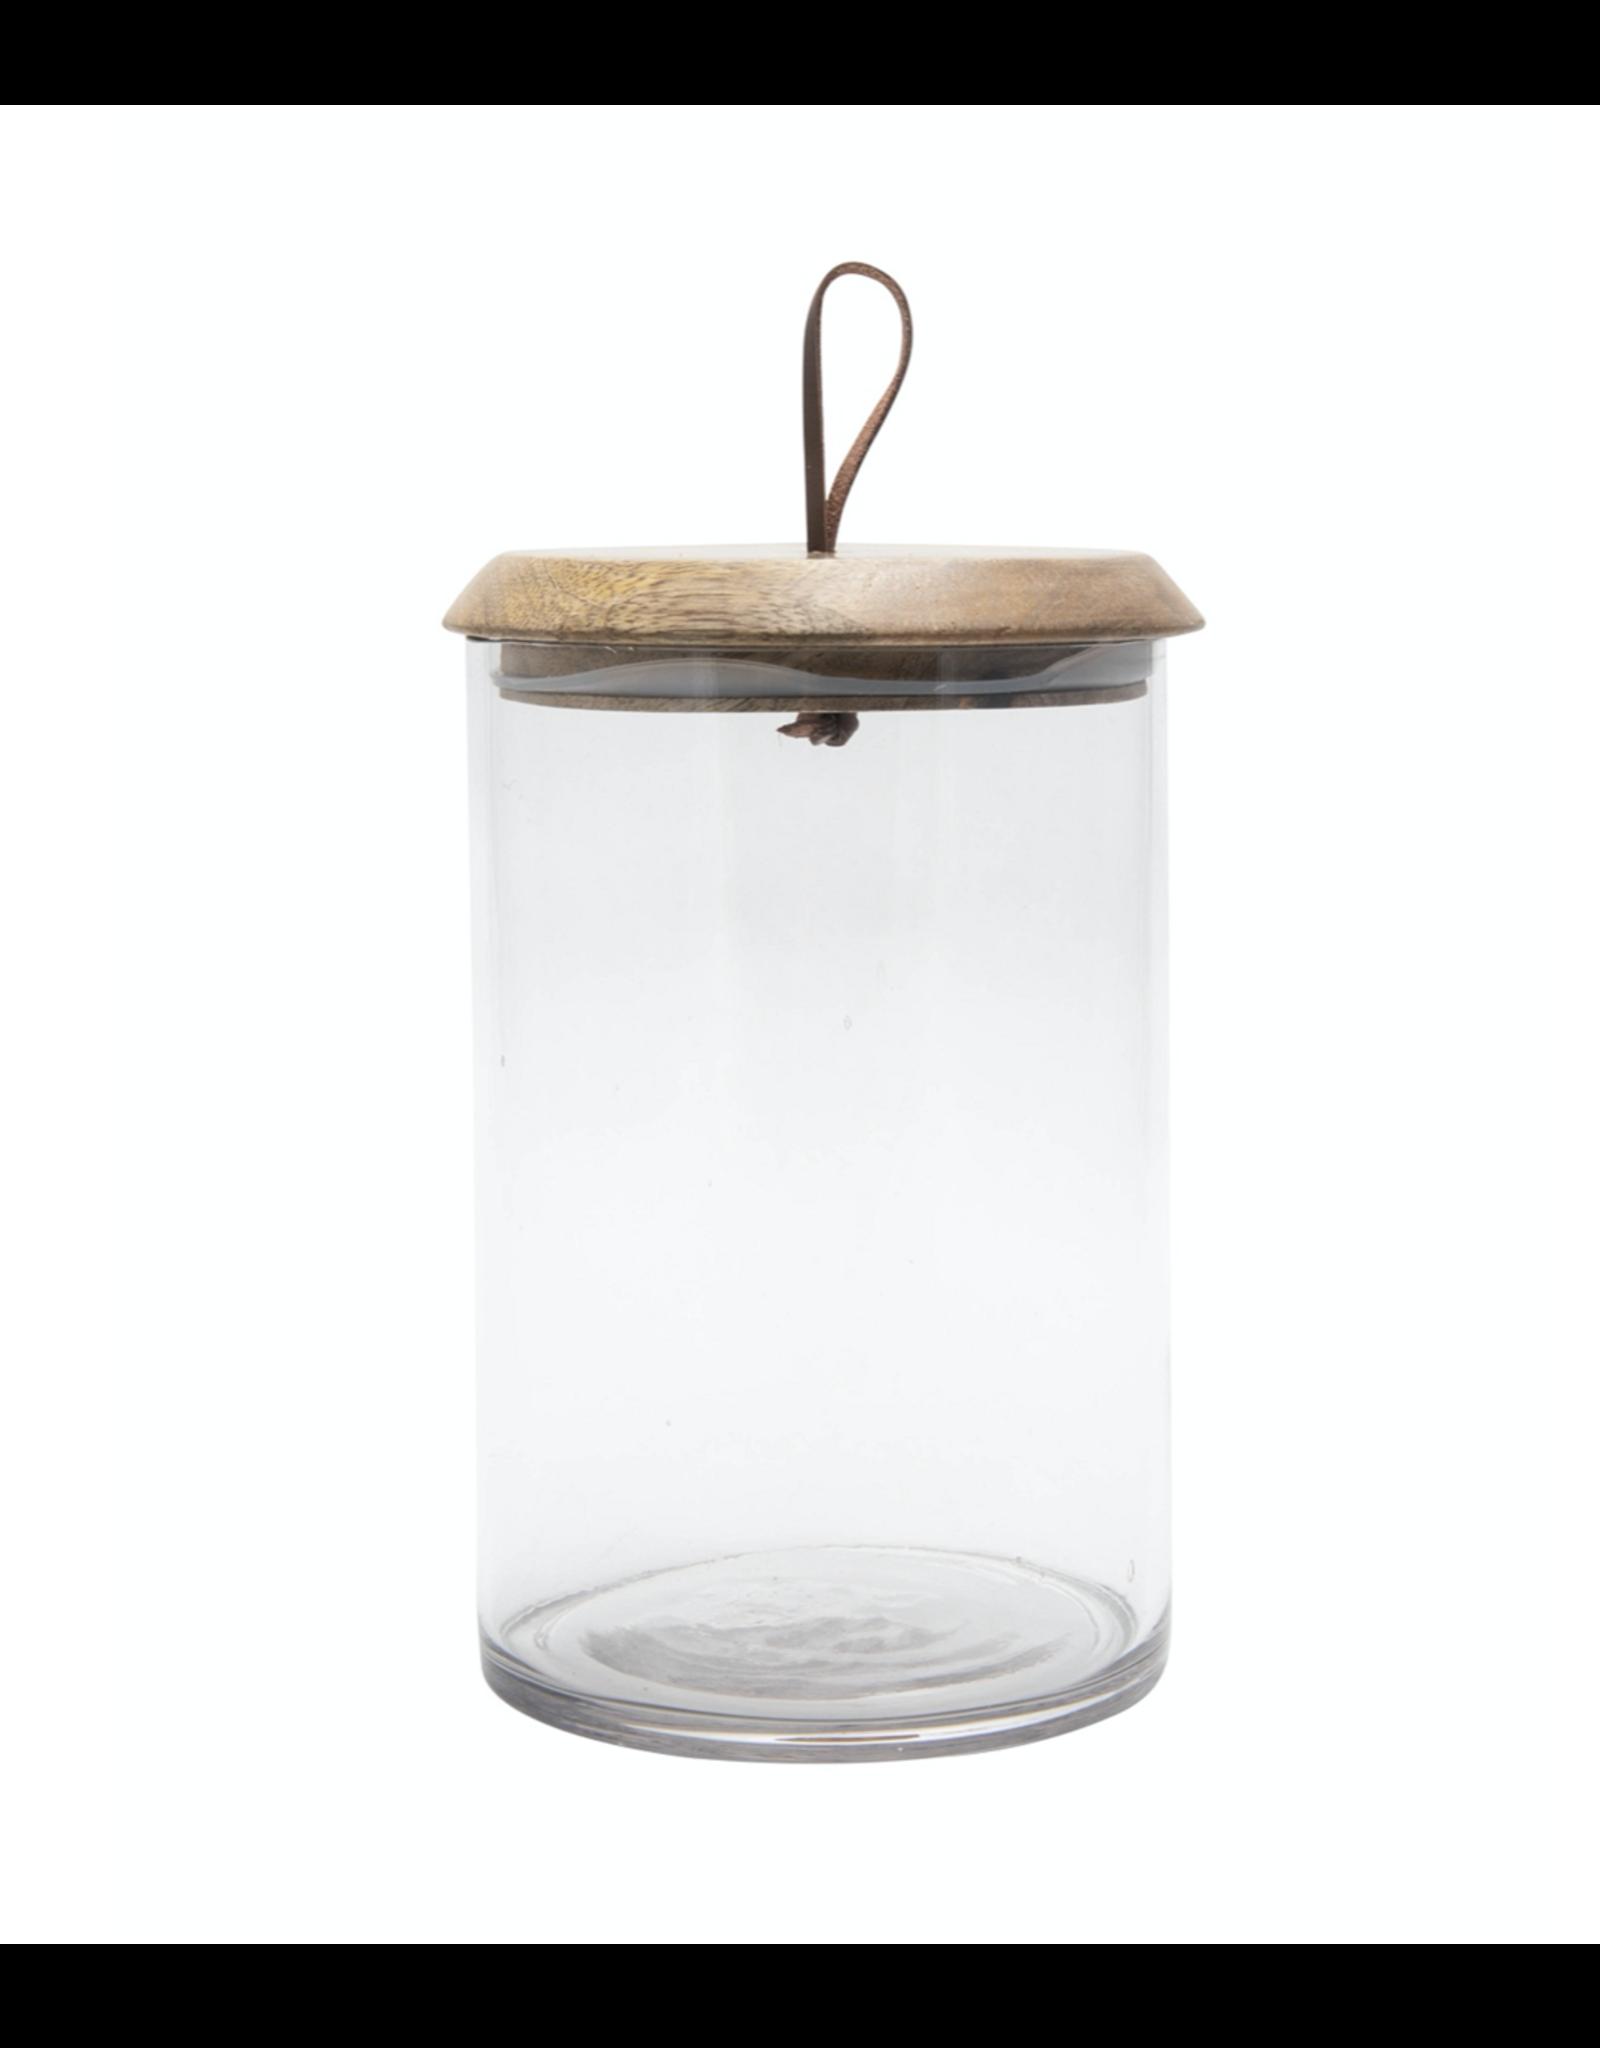 BIDK Small Mango & Glass Covered Jar